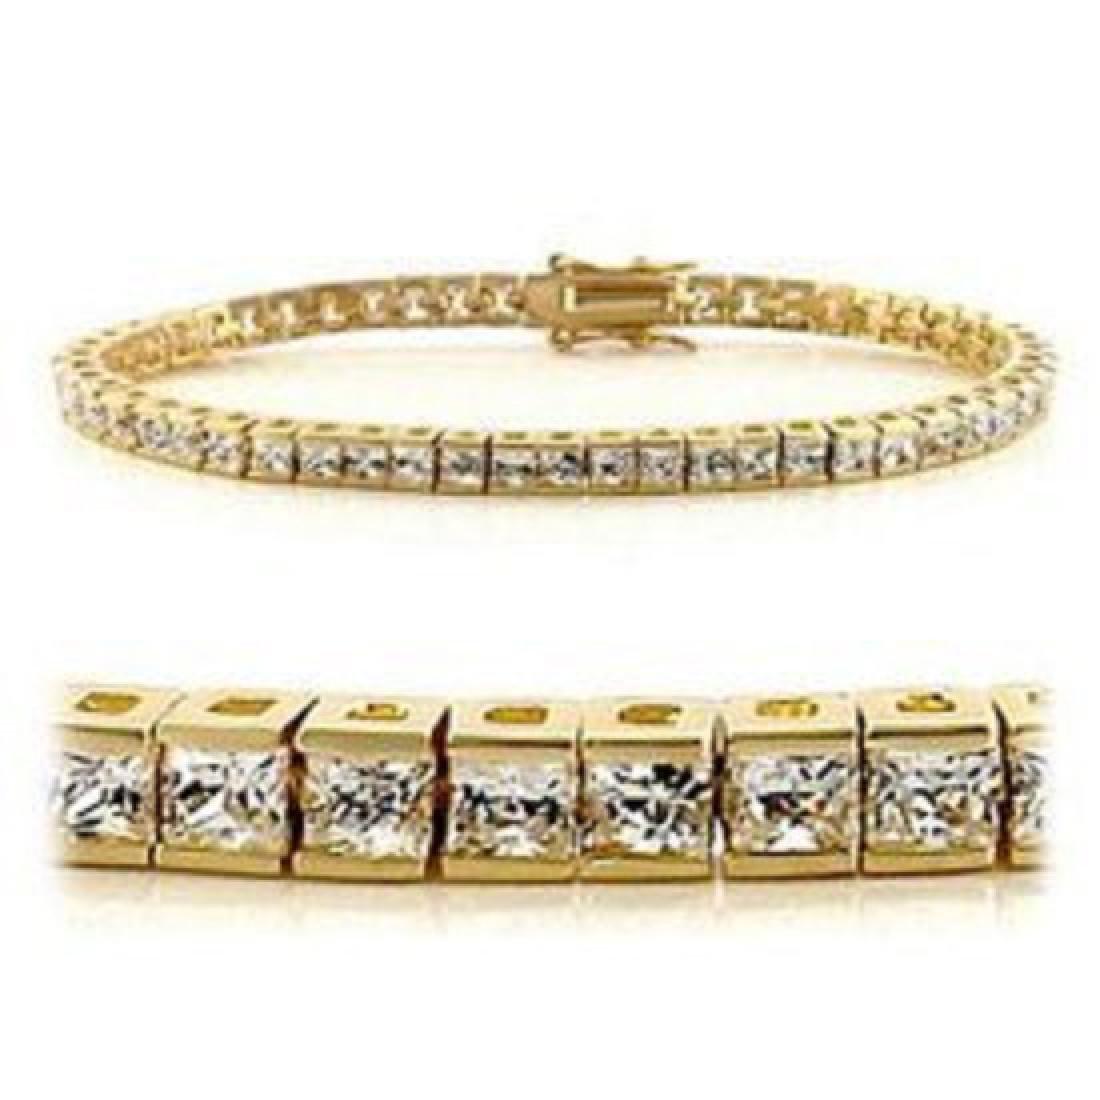 0.84 CT Diamond Designer Bracelet $1615